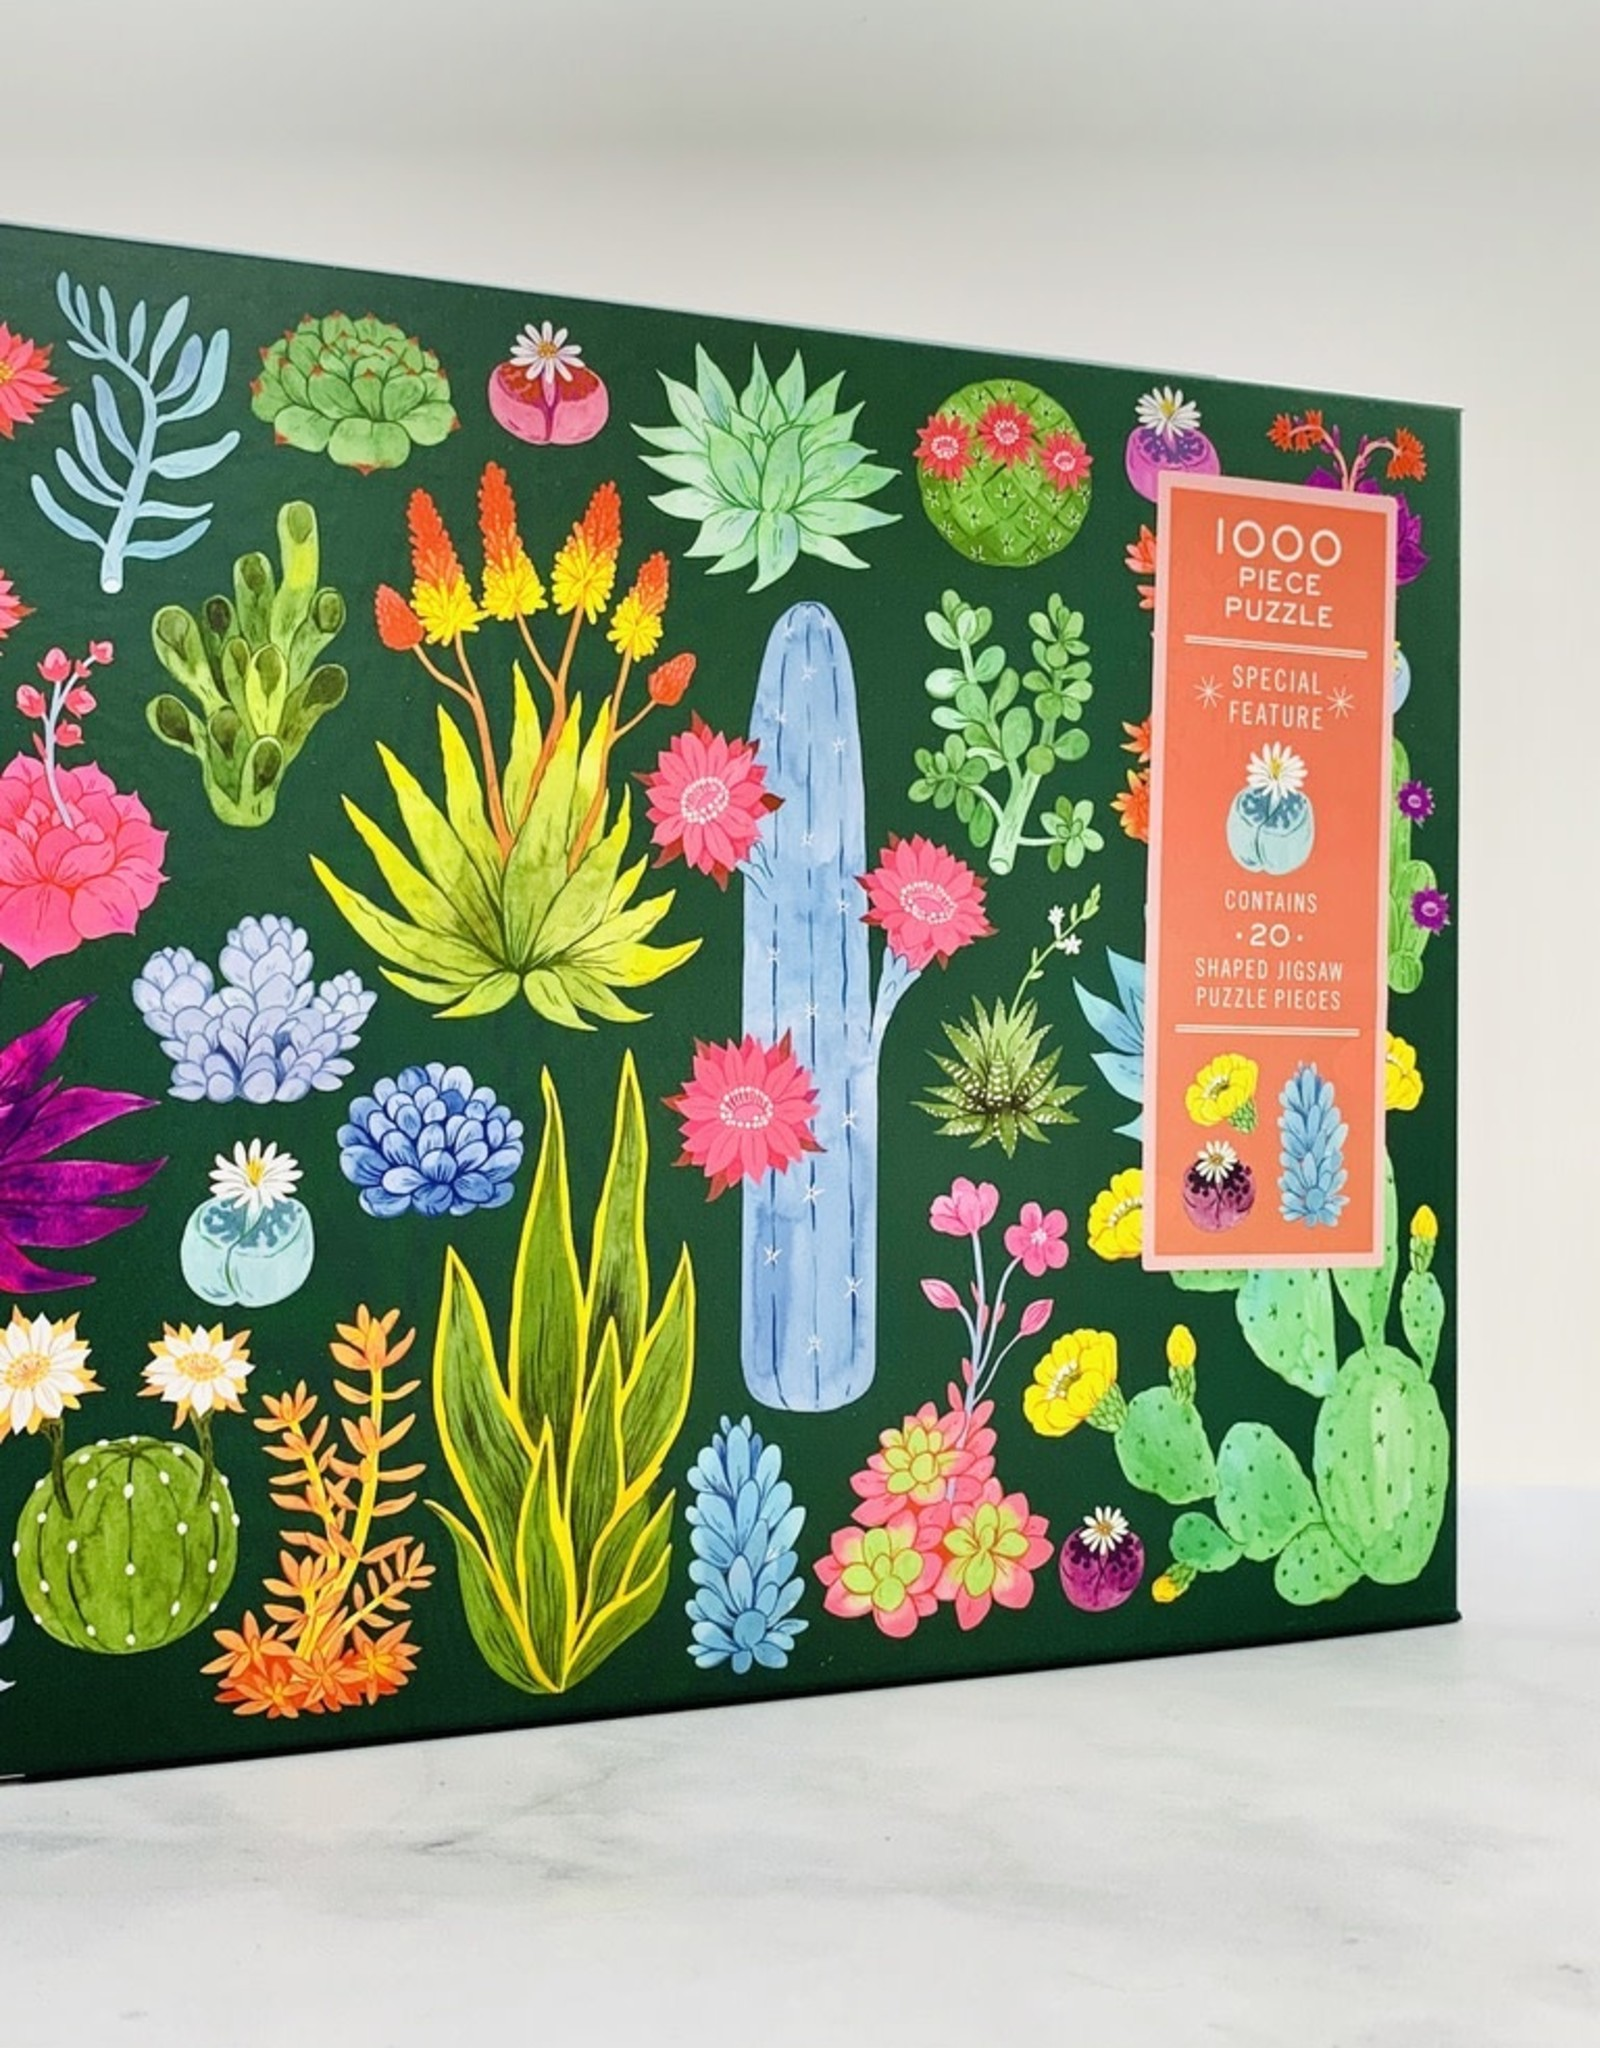 Desert Flora 1000 Piece Puzzle with Shaped Pieces